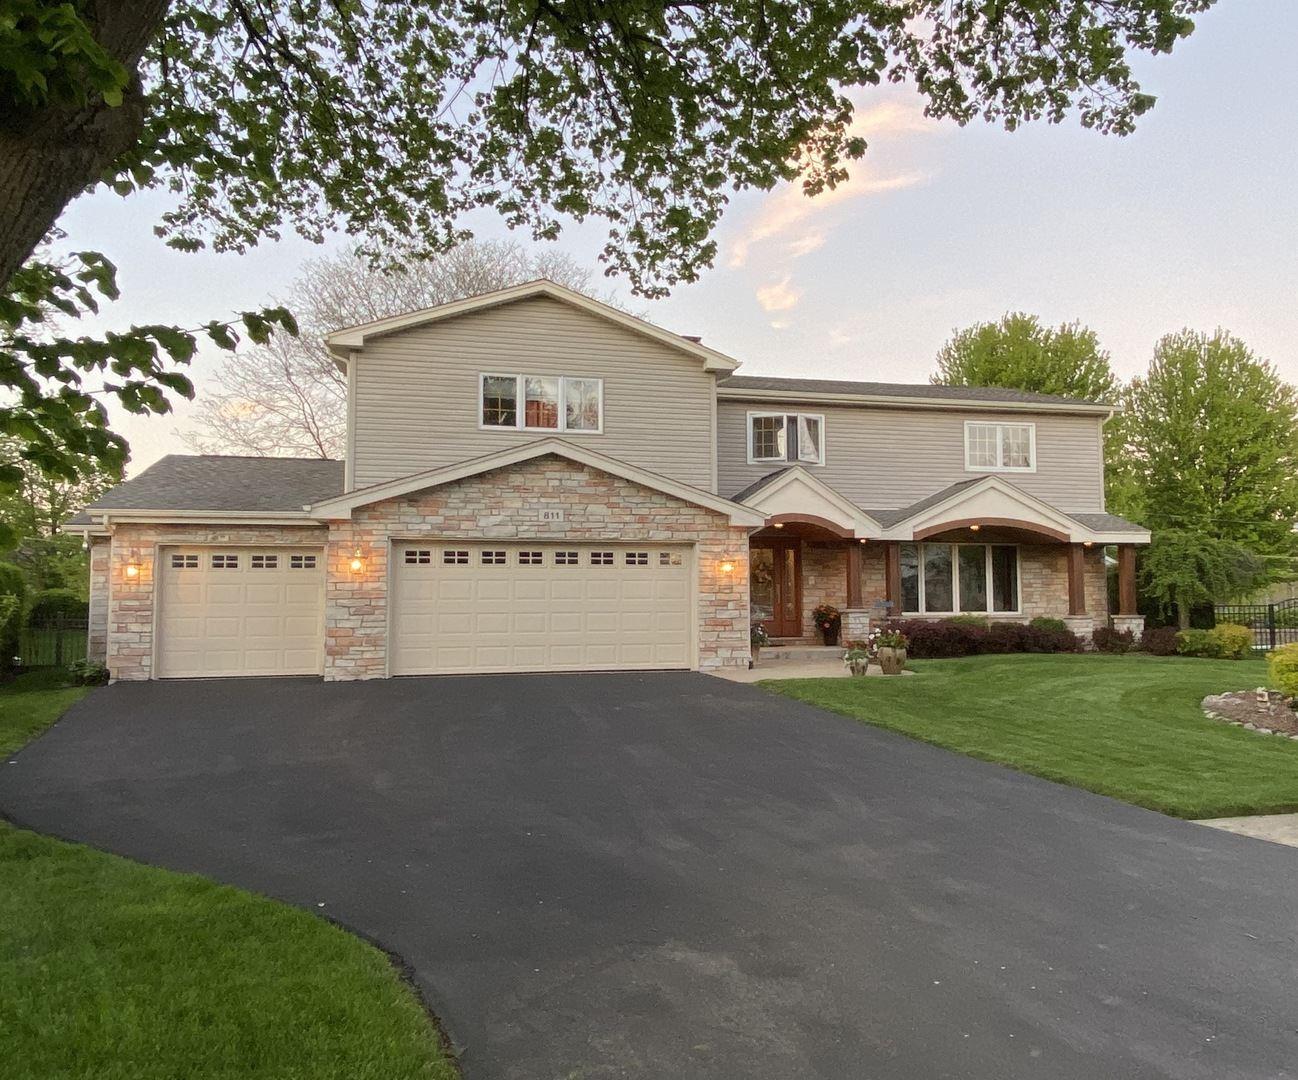 811 N Newberry Lane, Mount Prospect, IL 60056 - #: 10724187